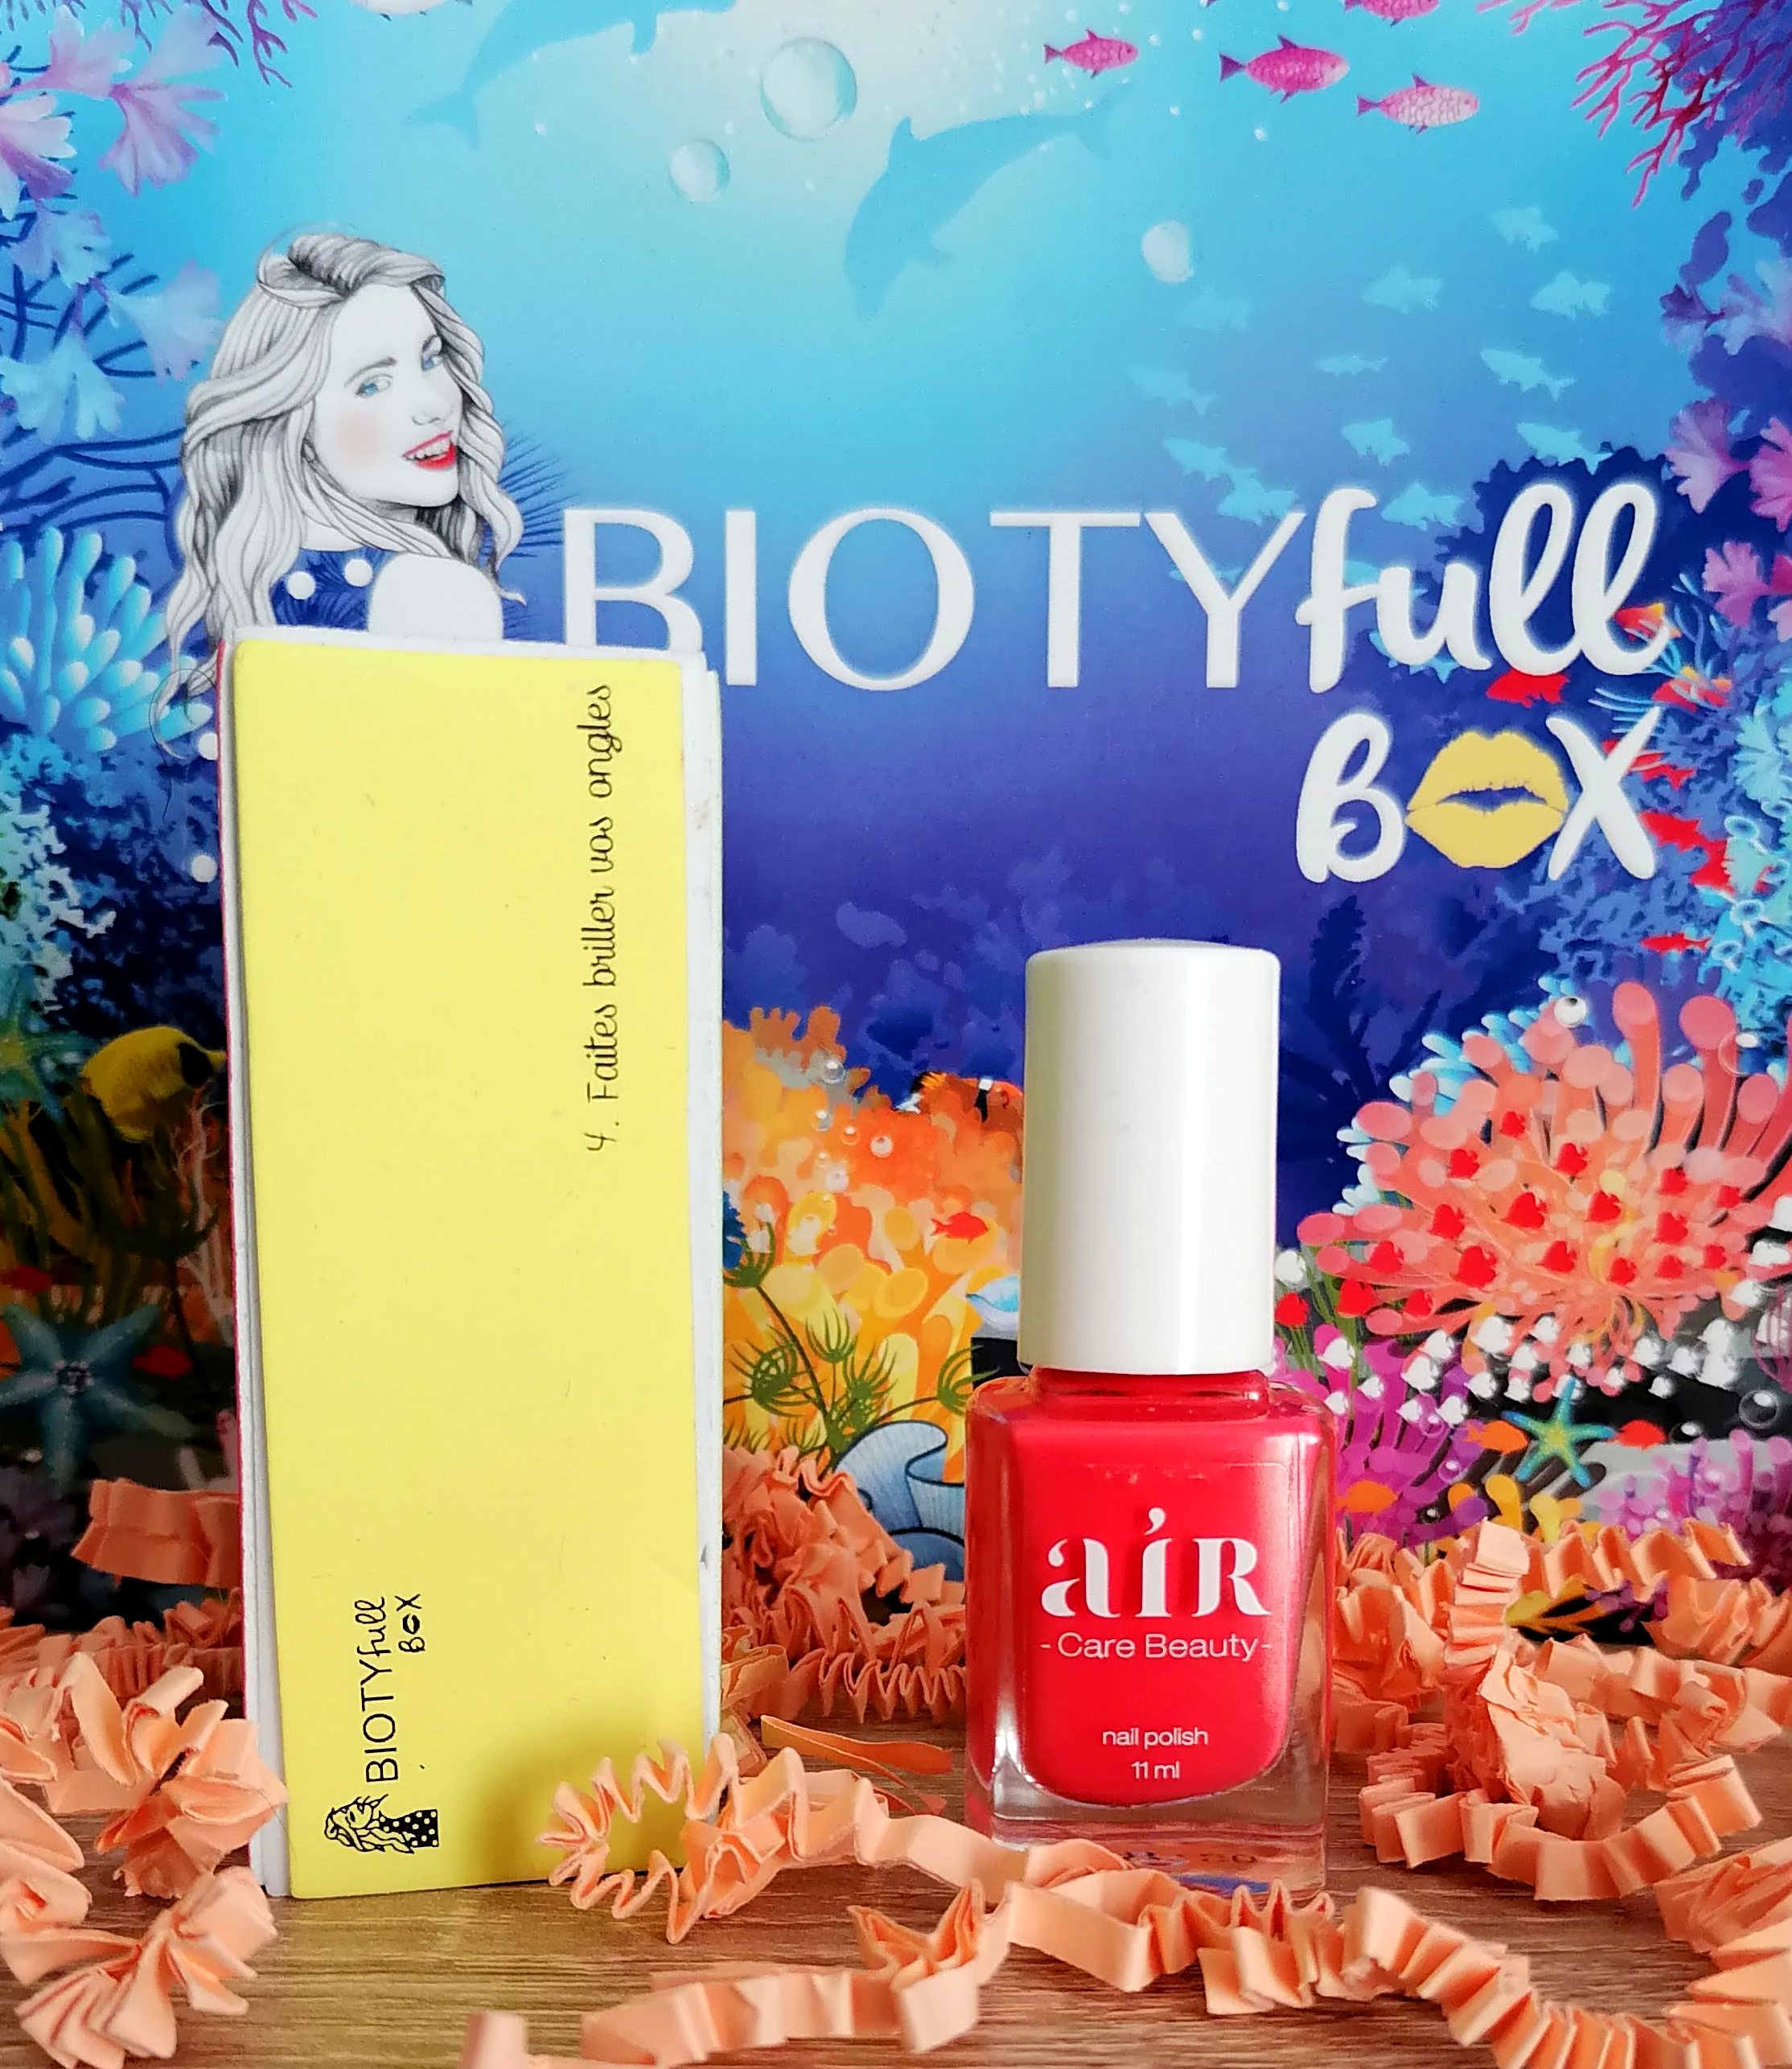 BIOTYFULL Box Juillet 2020 / La Marine